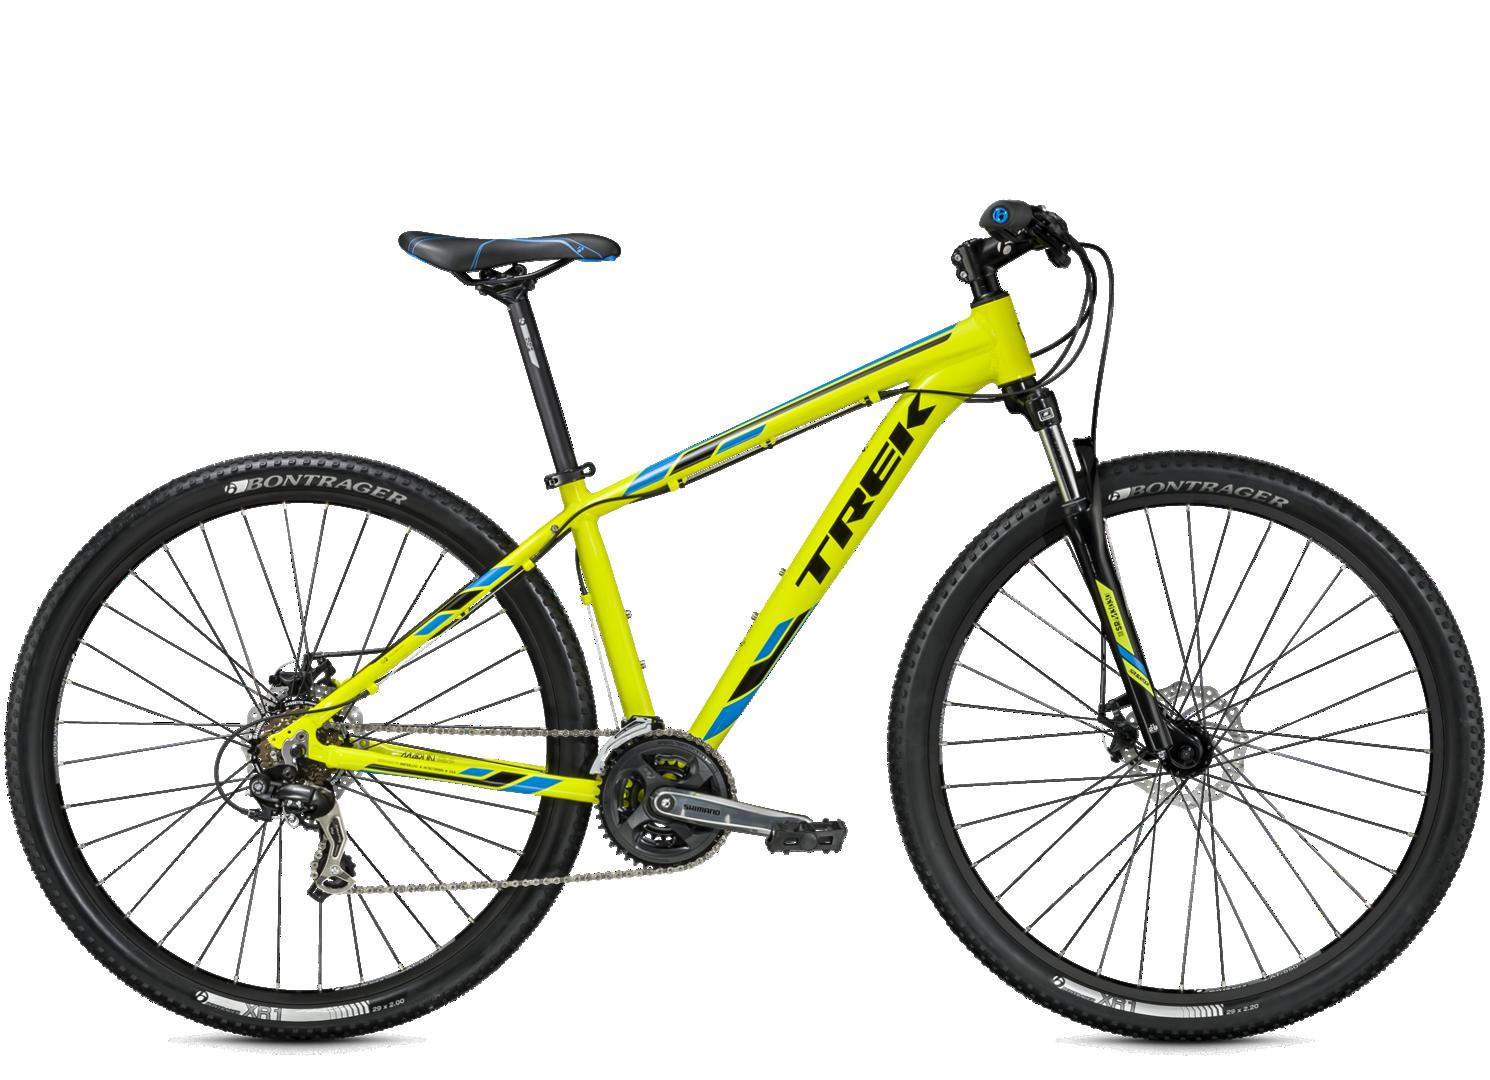 Bicicleta MARLIN 5